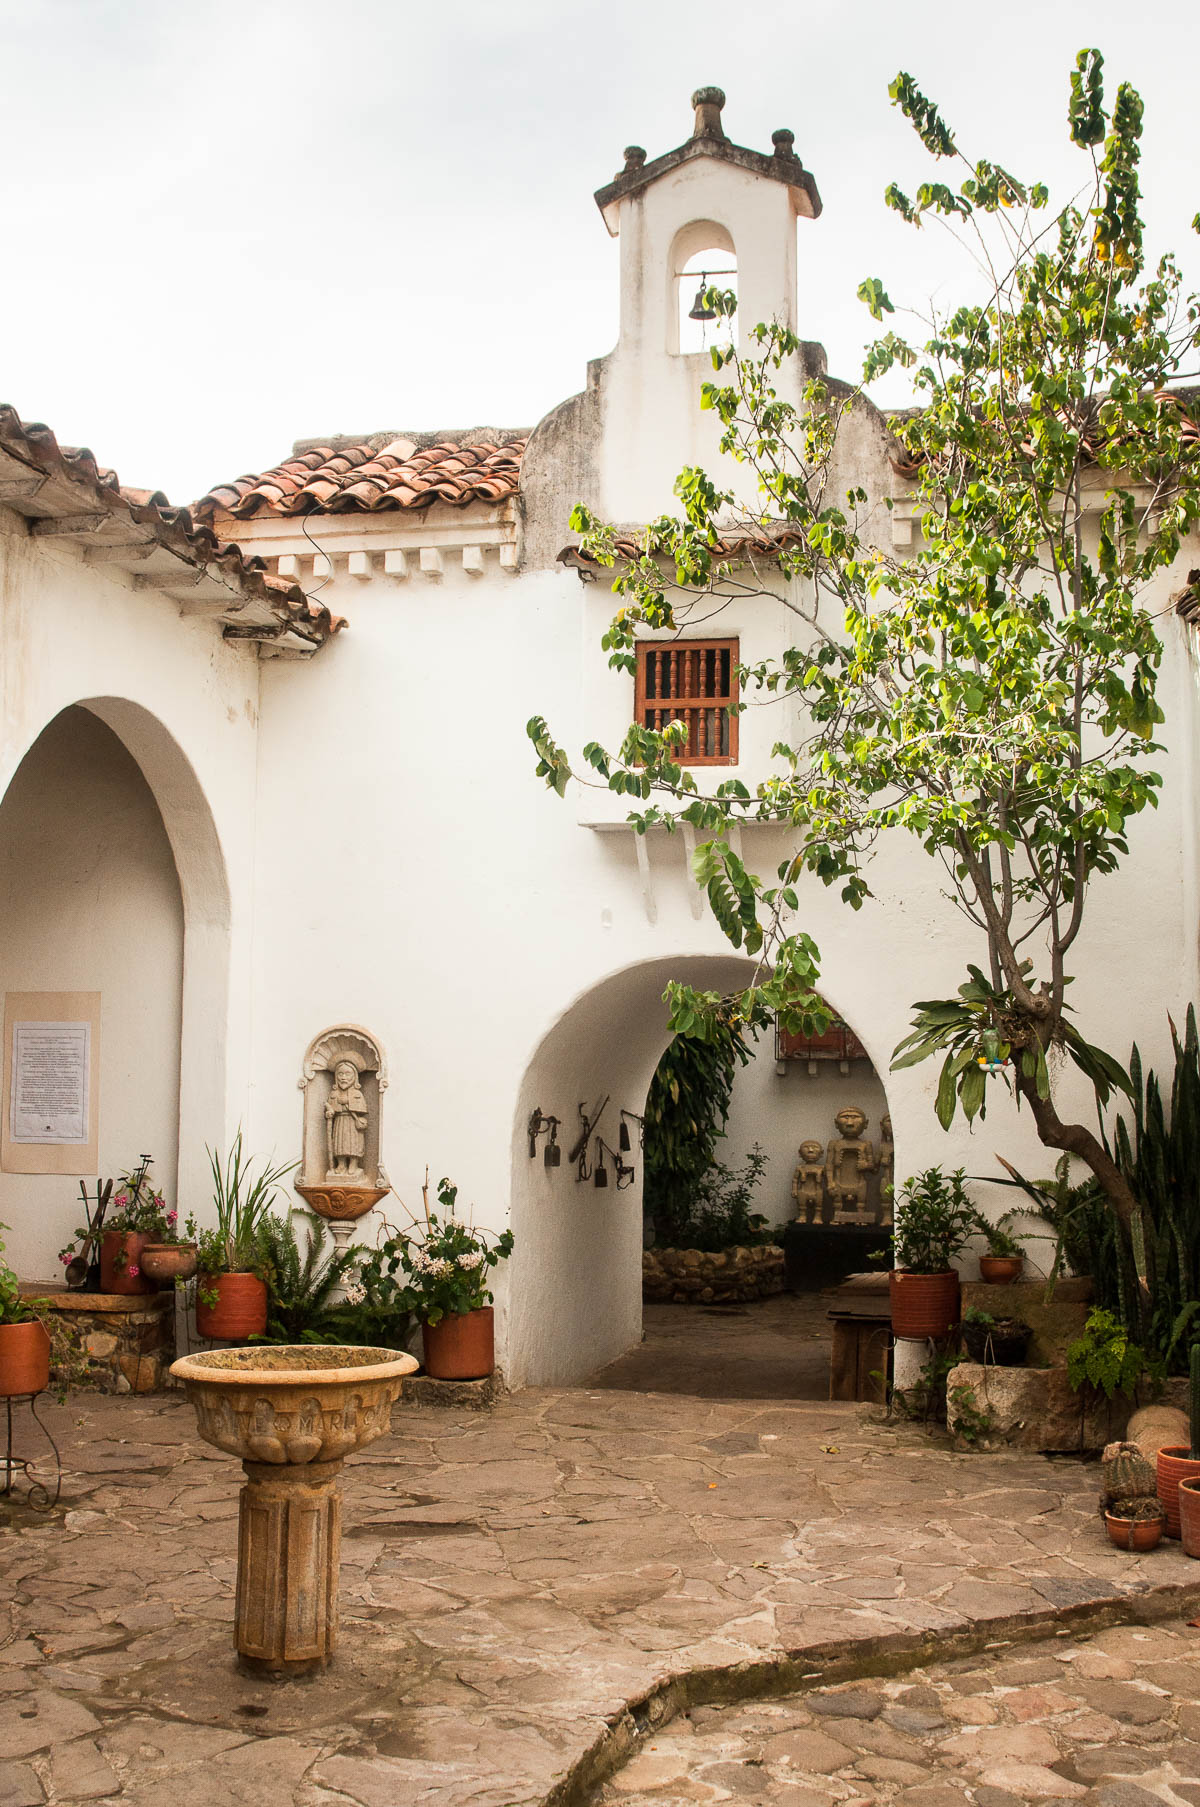 Cour du musée Acuna villa de leyva